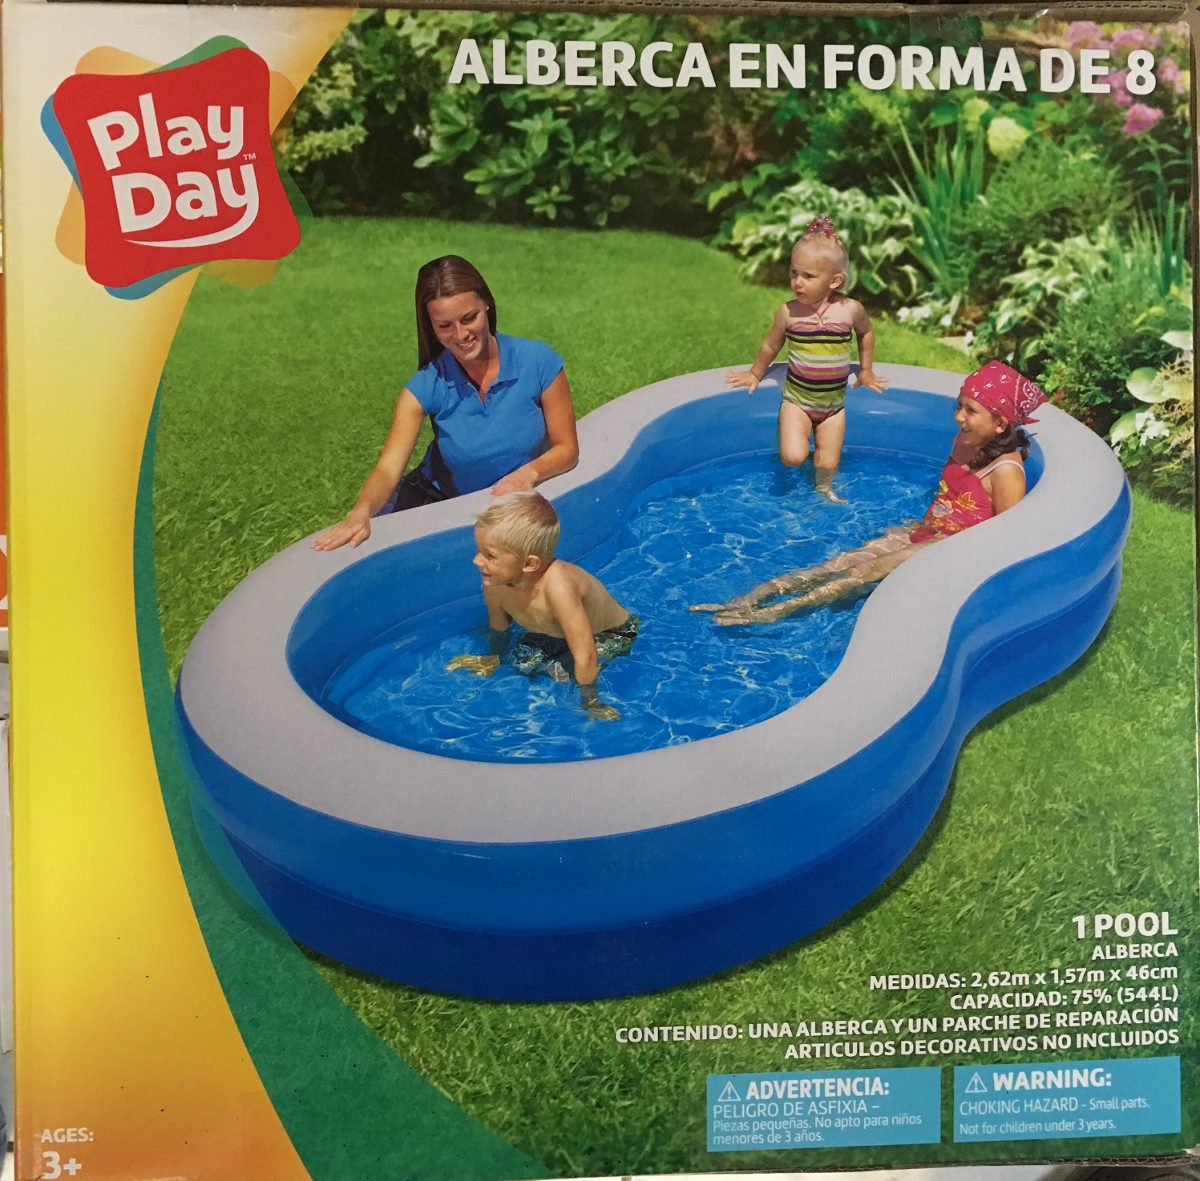 Alberca inflable grande ni os familiar azul en forma de 8 for Albercas inflables grandes baratas